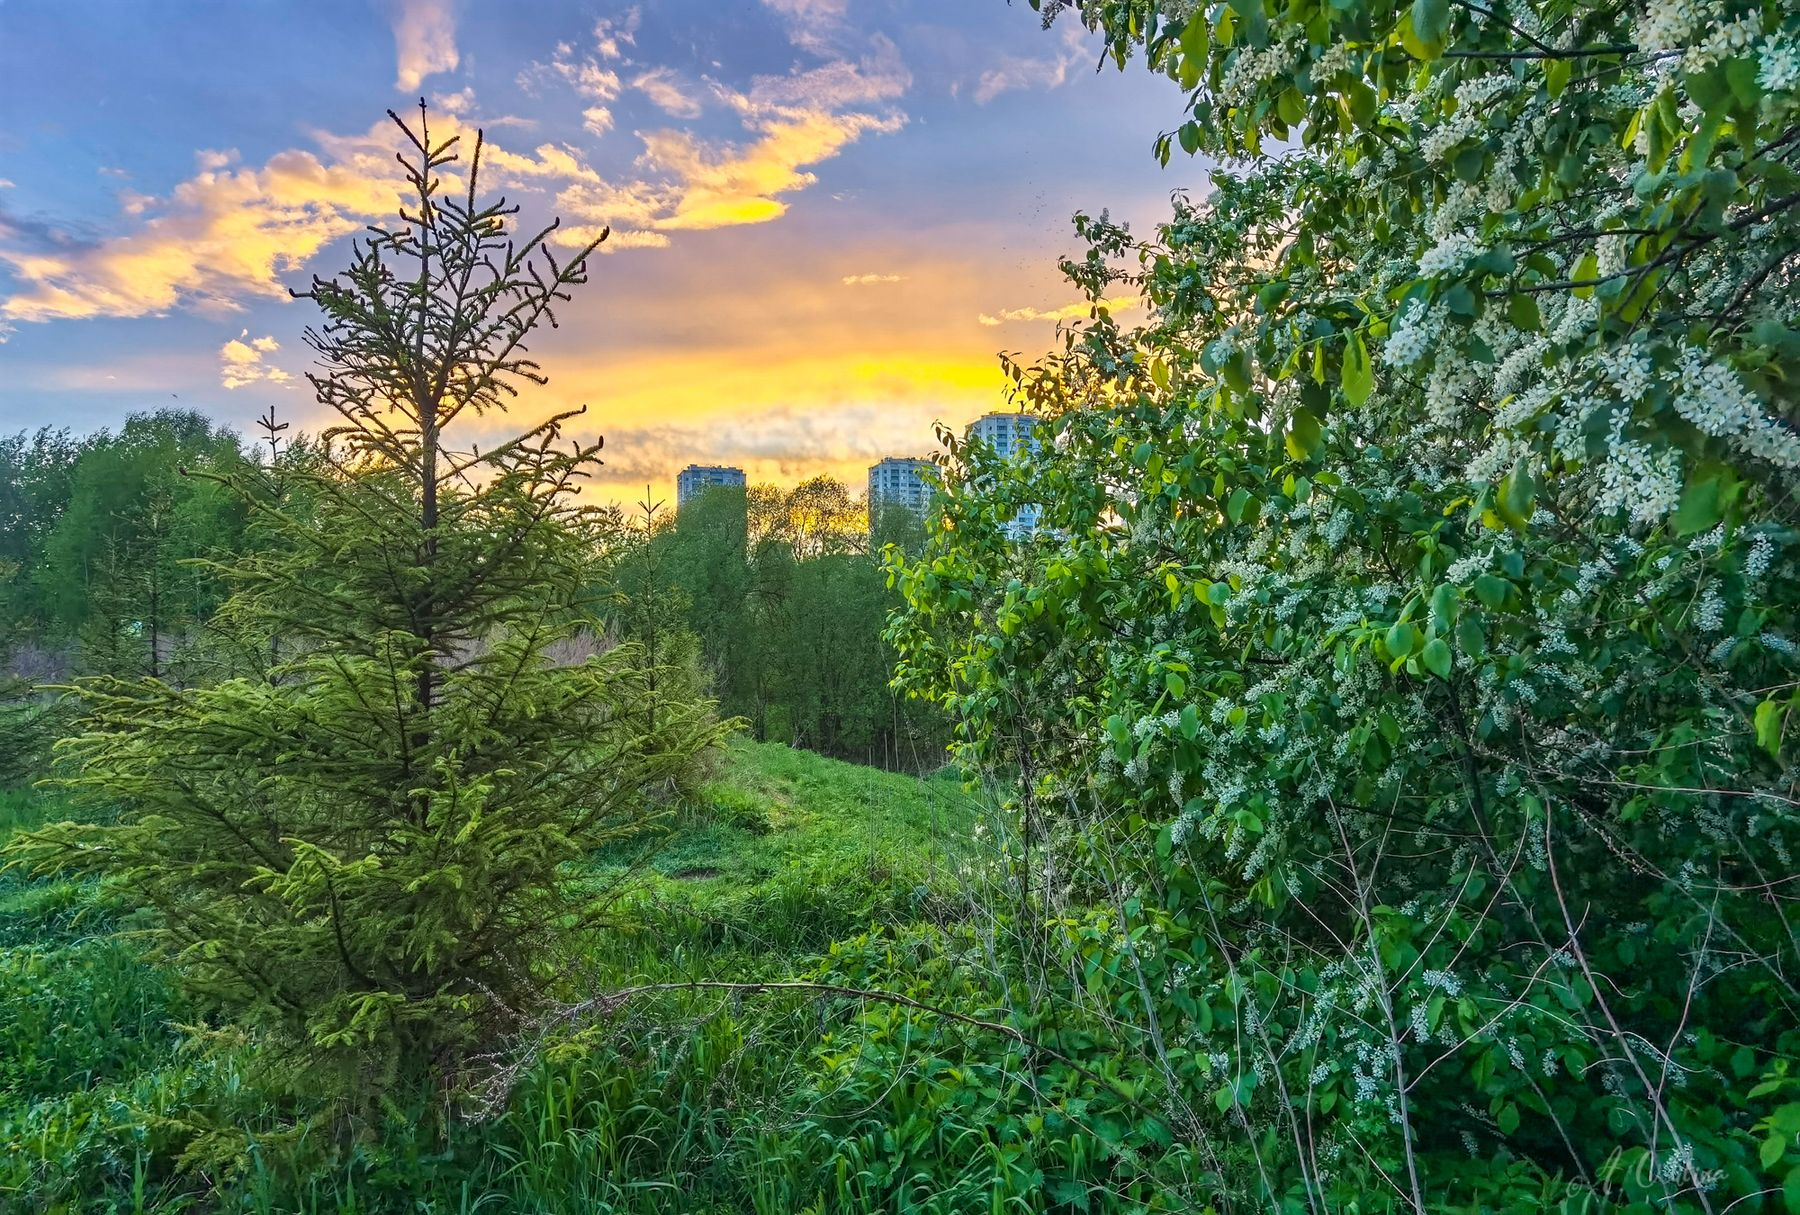 Дурман черемухового вечера вечер закат елка черемуха аромат соловьи холм дома город лес облака